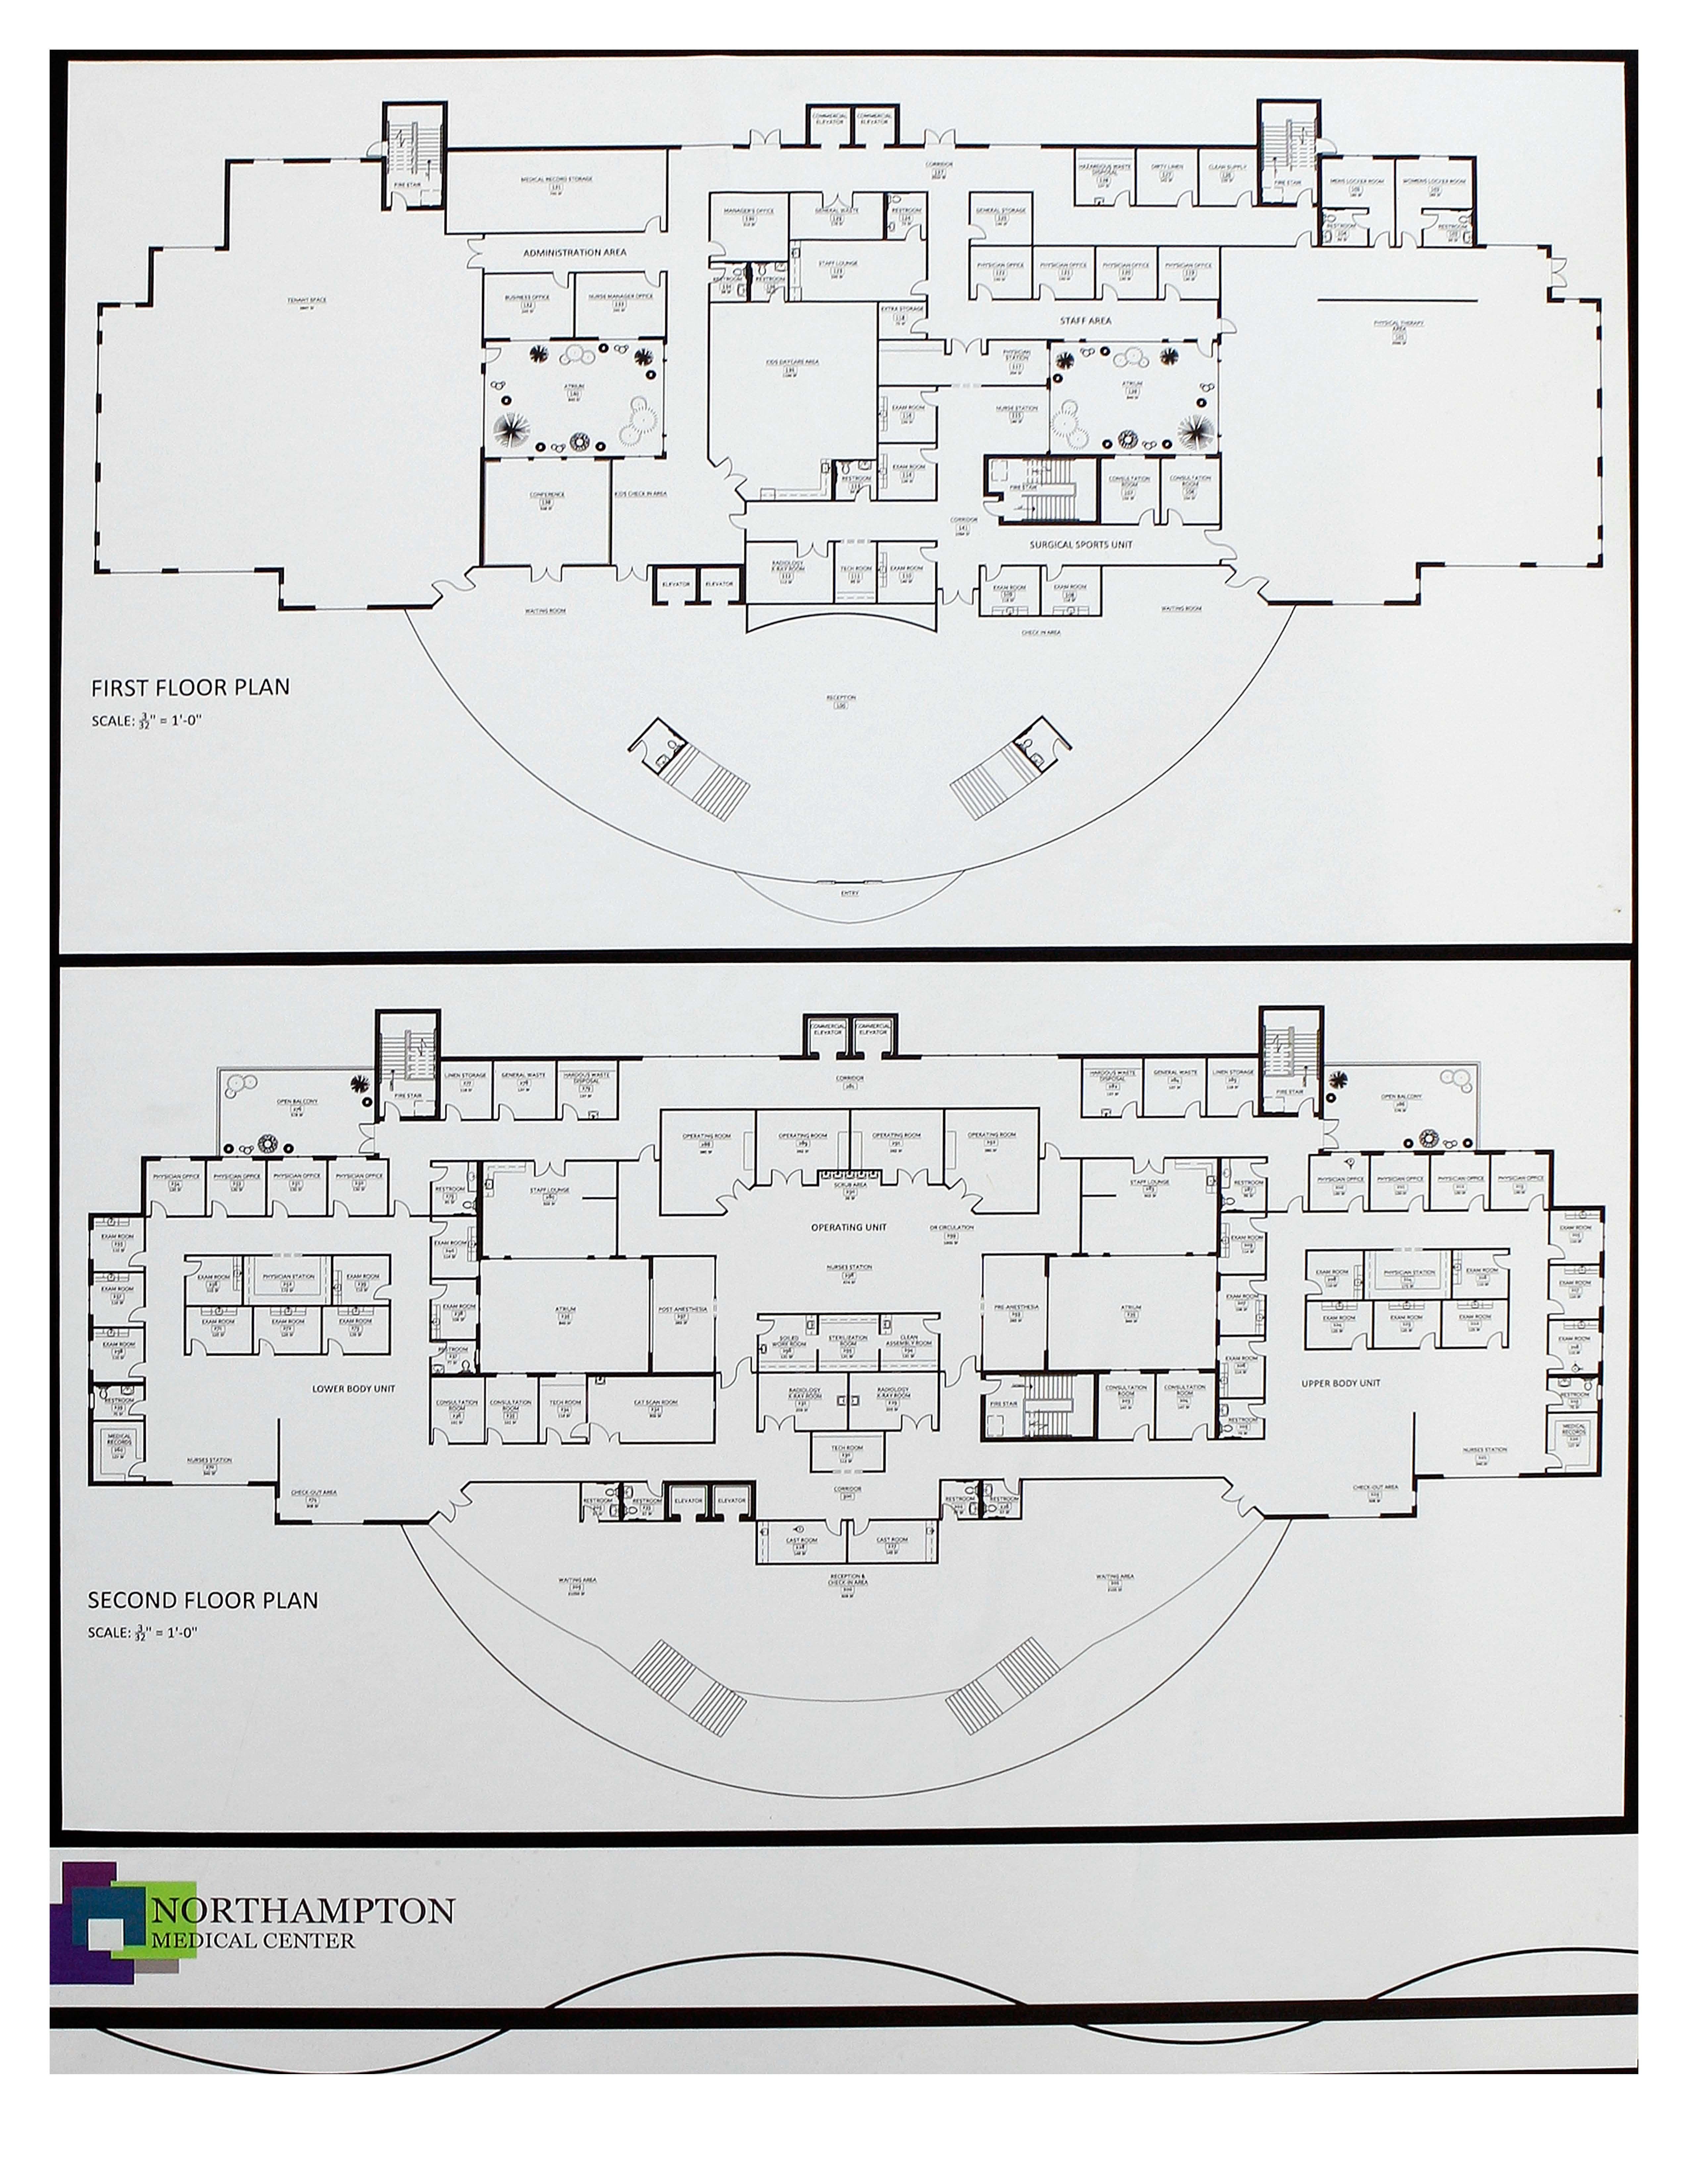 Primary health care floor plan